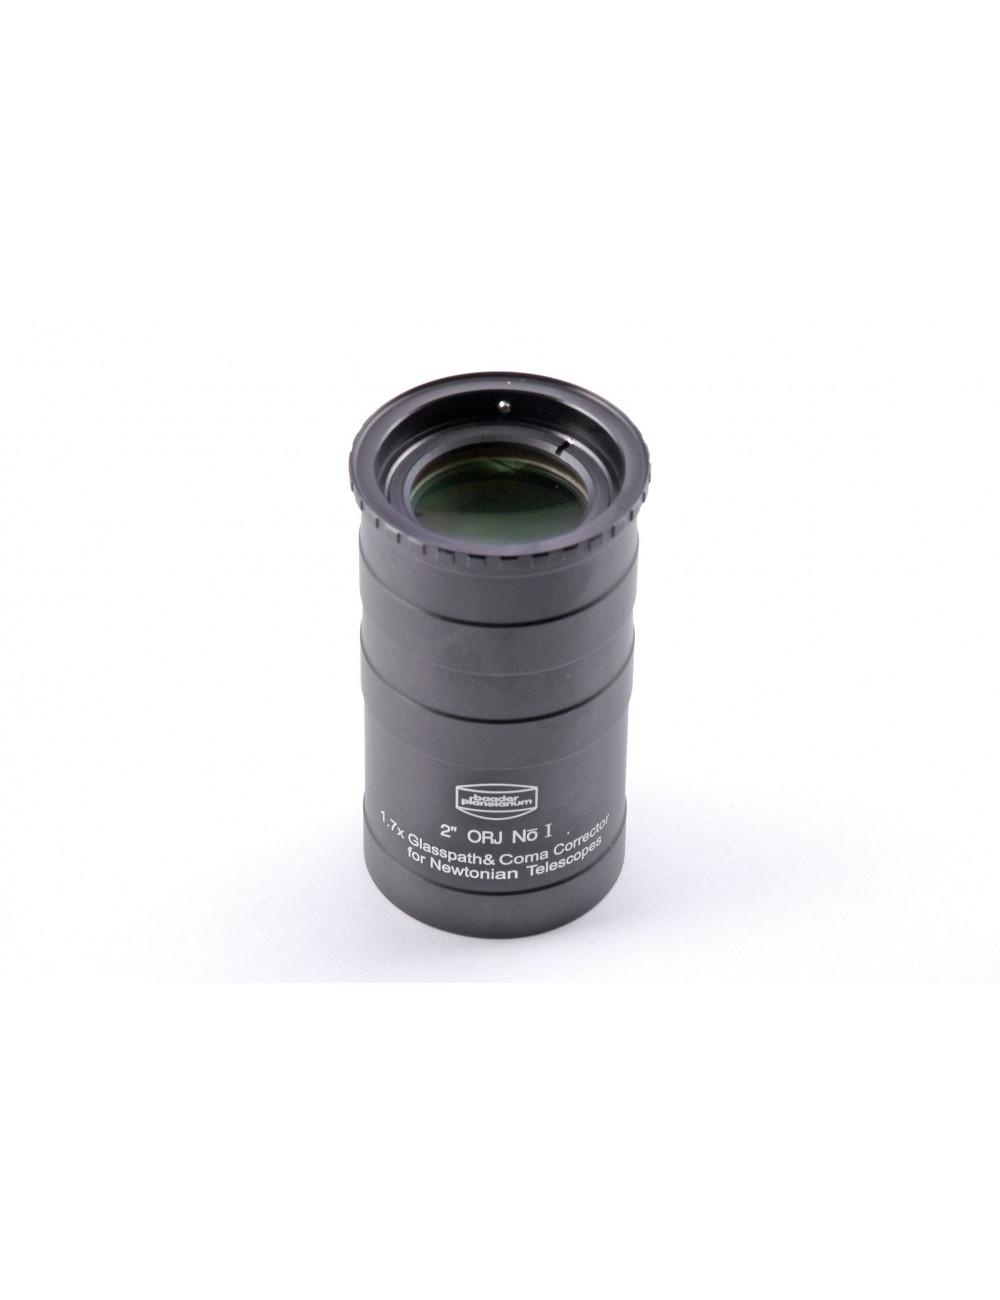 Correcteur Glasspath 50,8 mm 1:1,70 Baader pour Newton